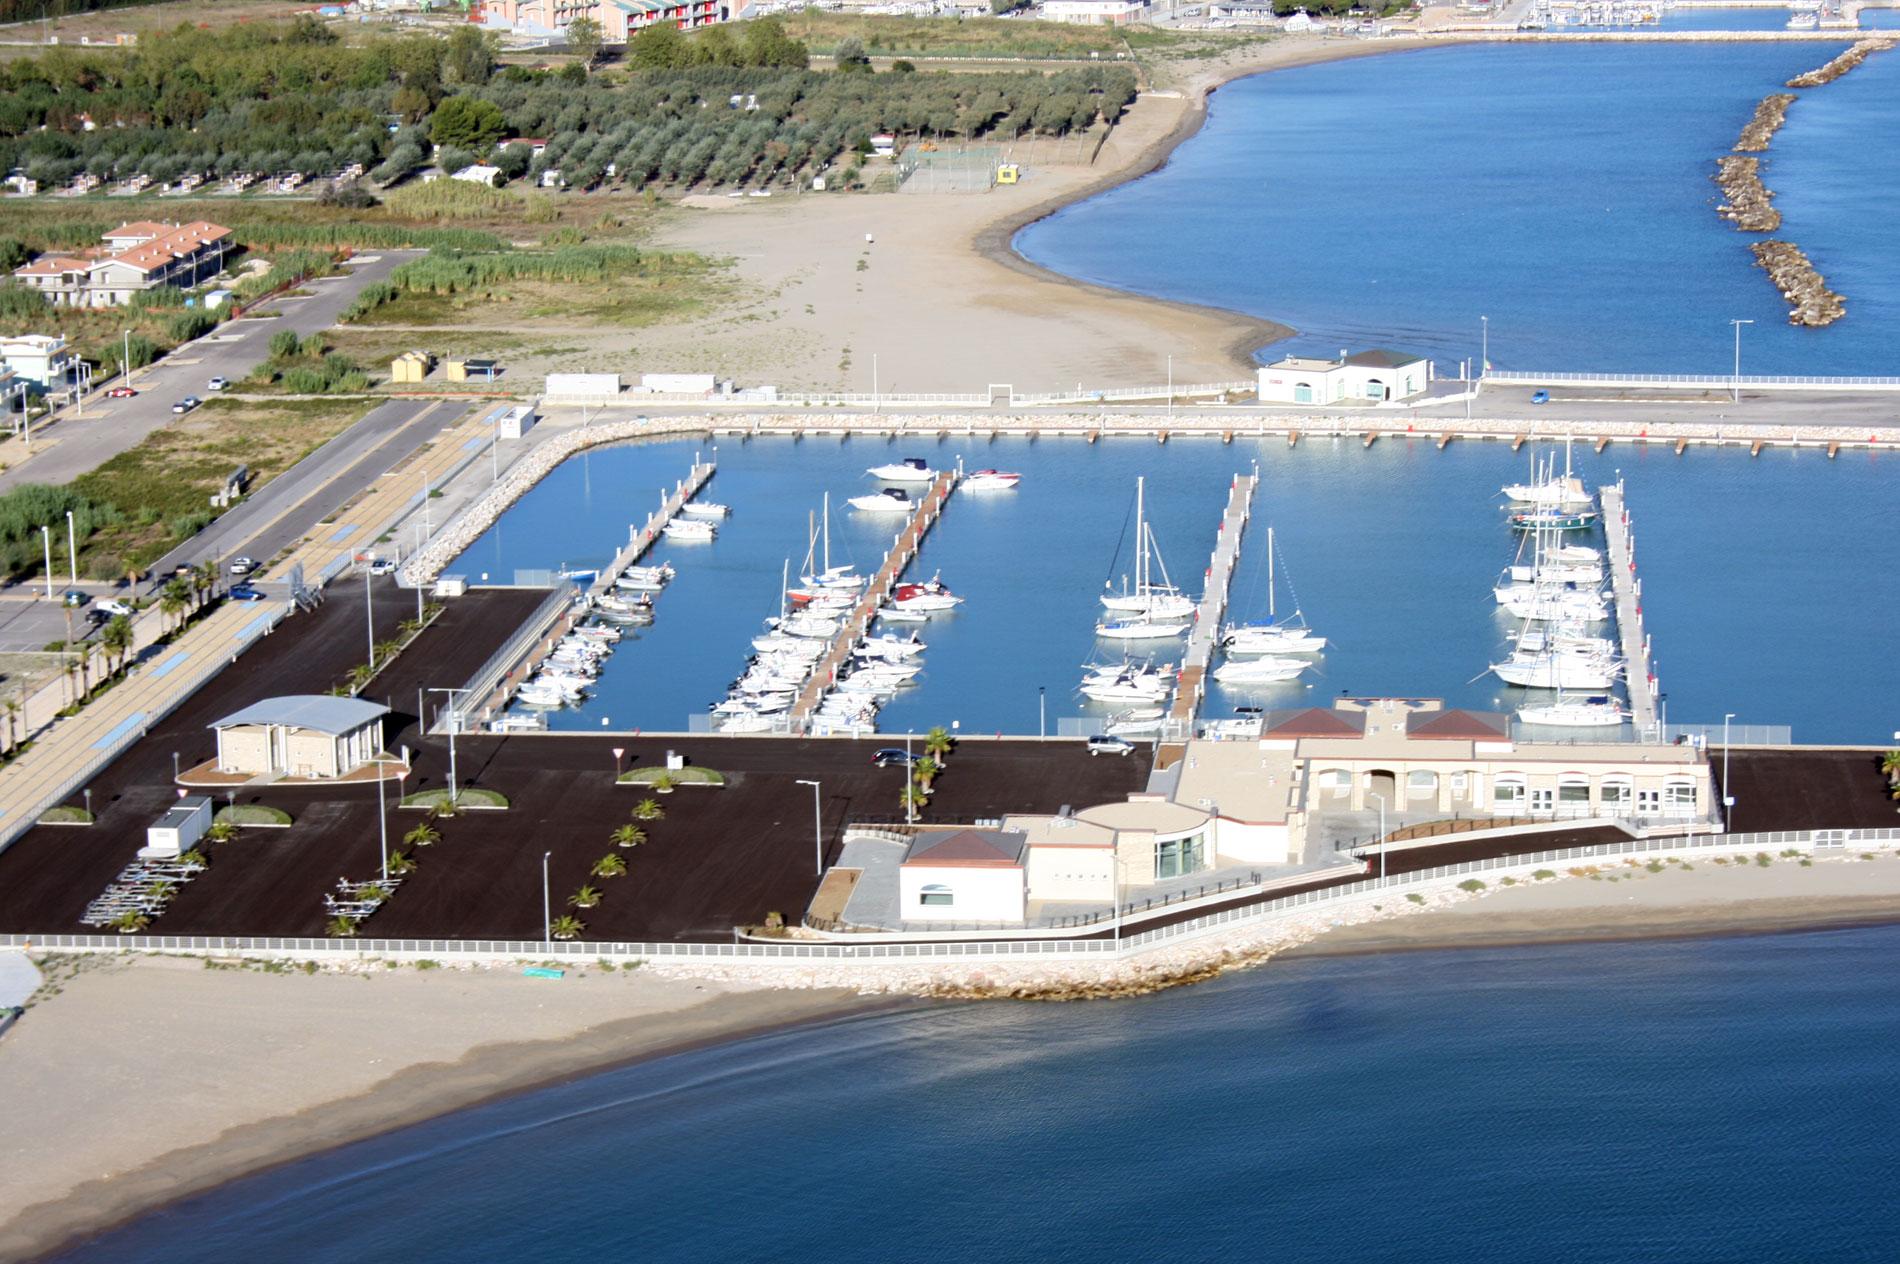 Porto-turistico-Marina-Sveva-Molise-H03